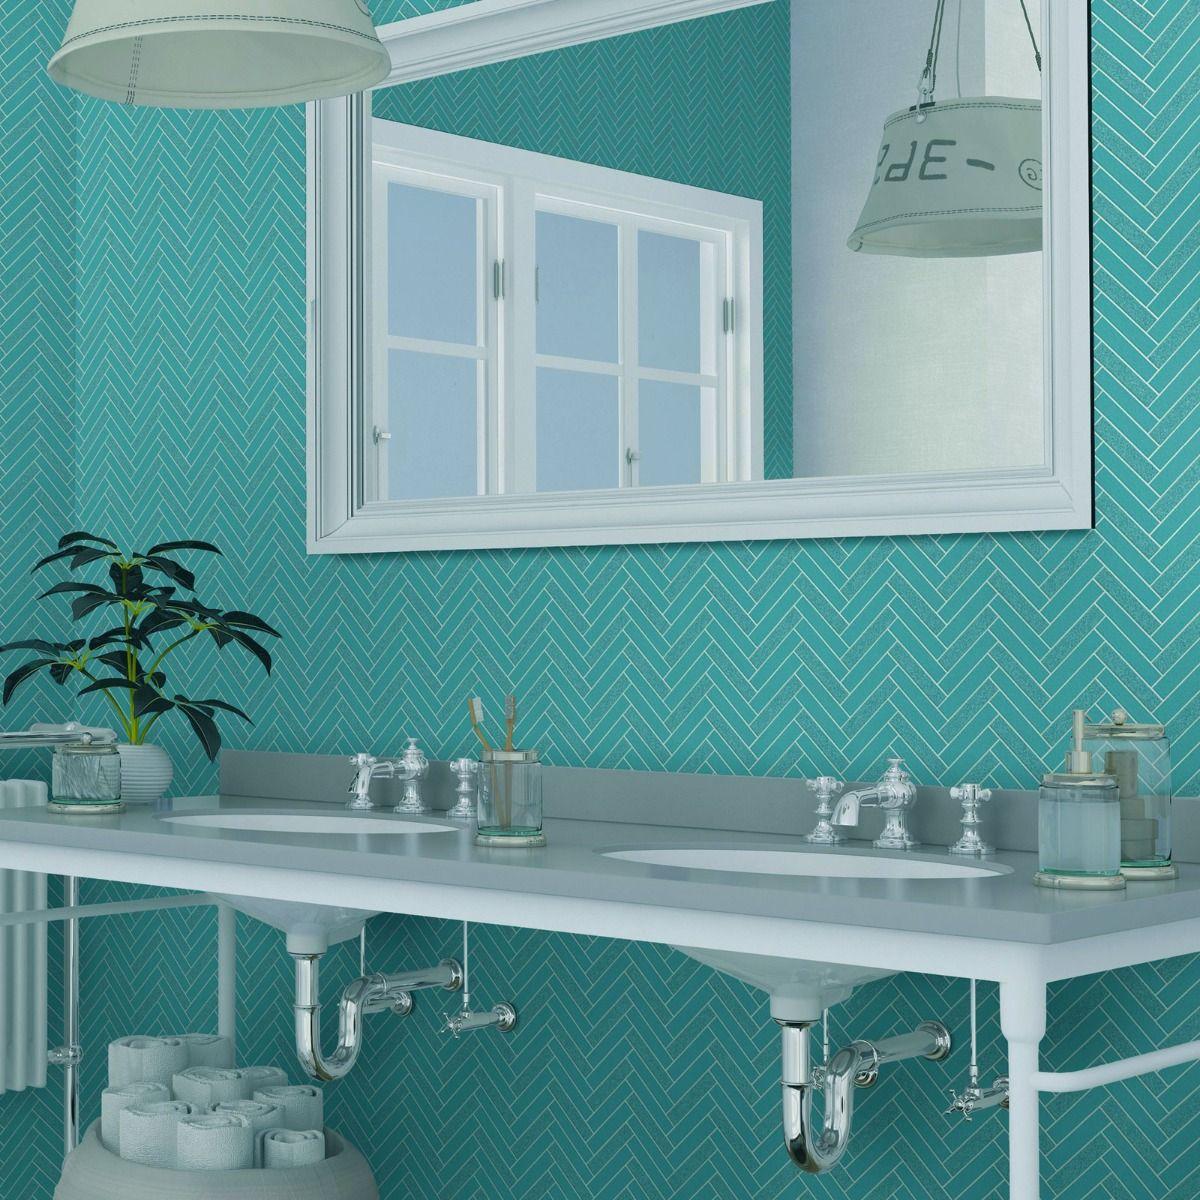 blue tile replica wallpaper